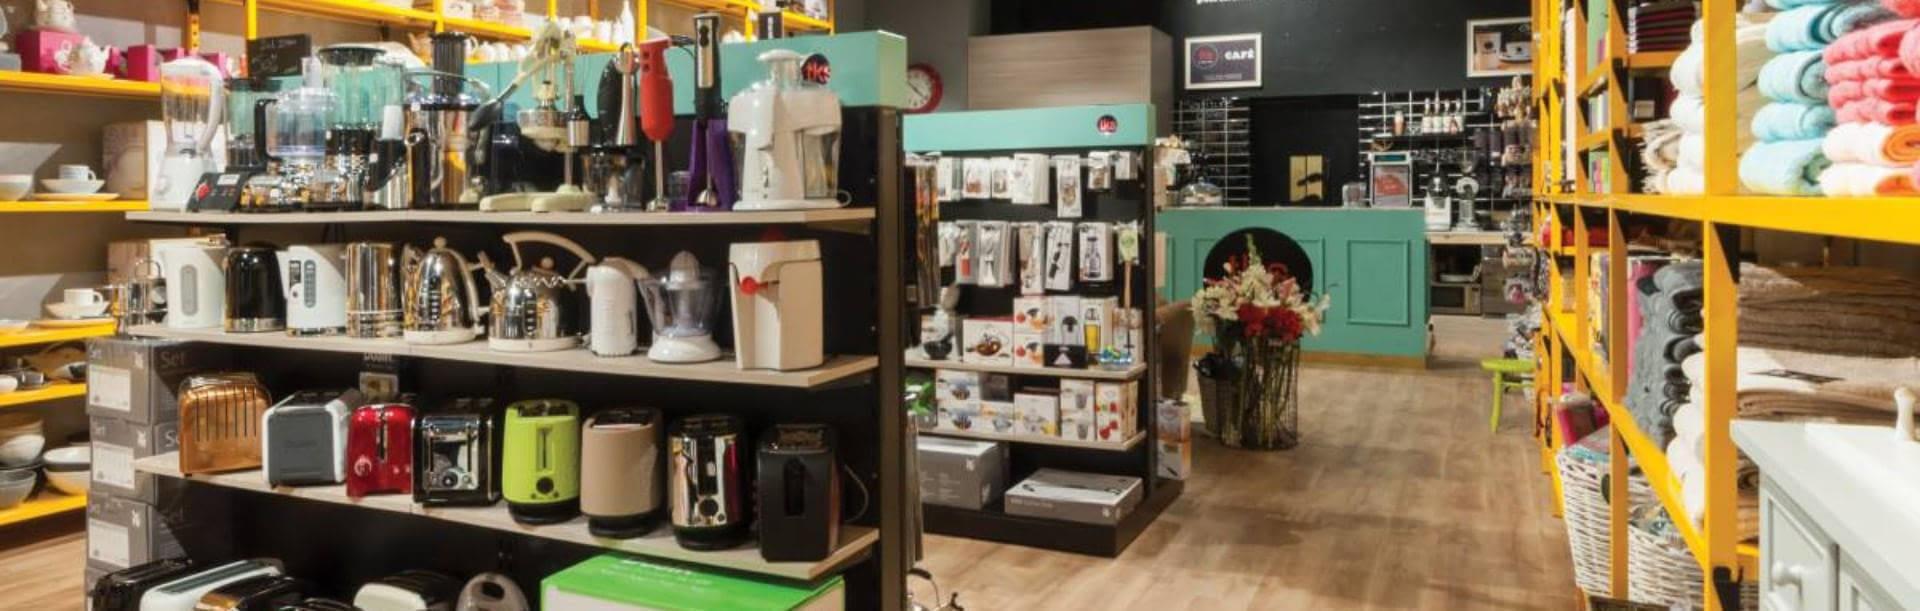 Tks The Kitchen Store Household Goods In Victoria Gozo